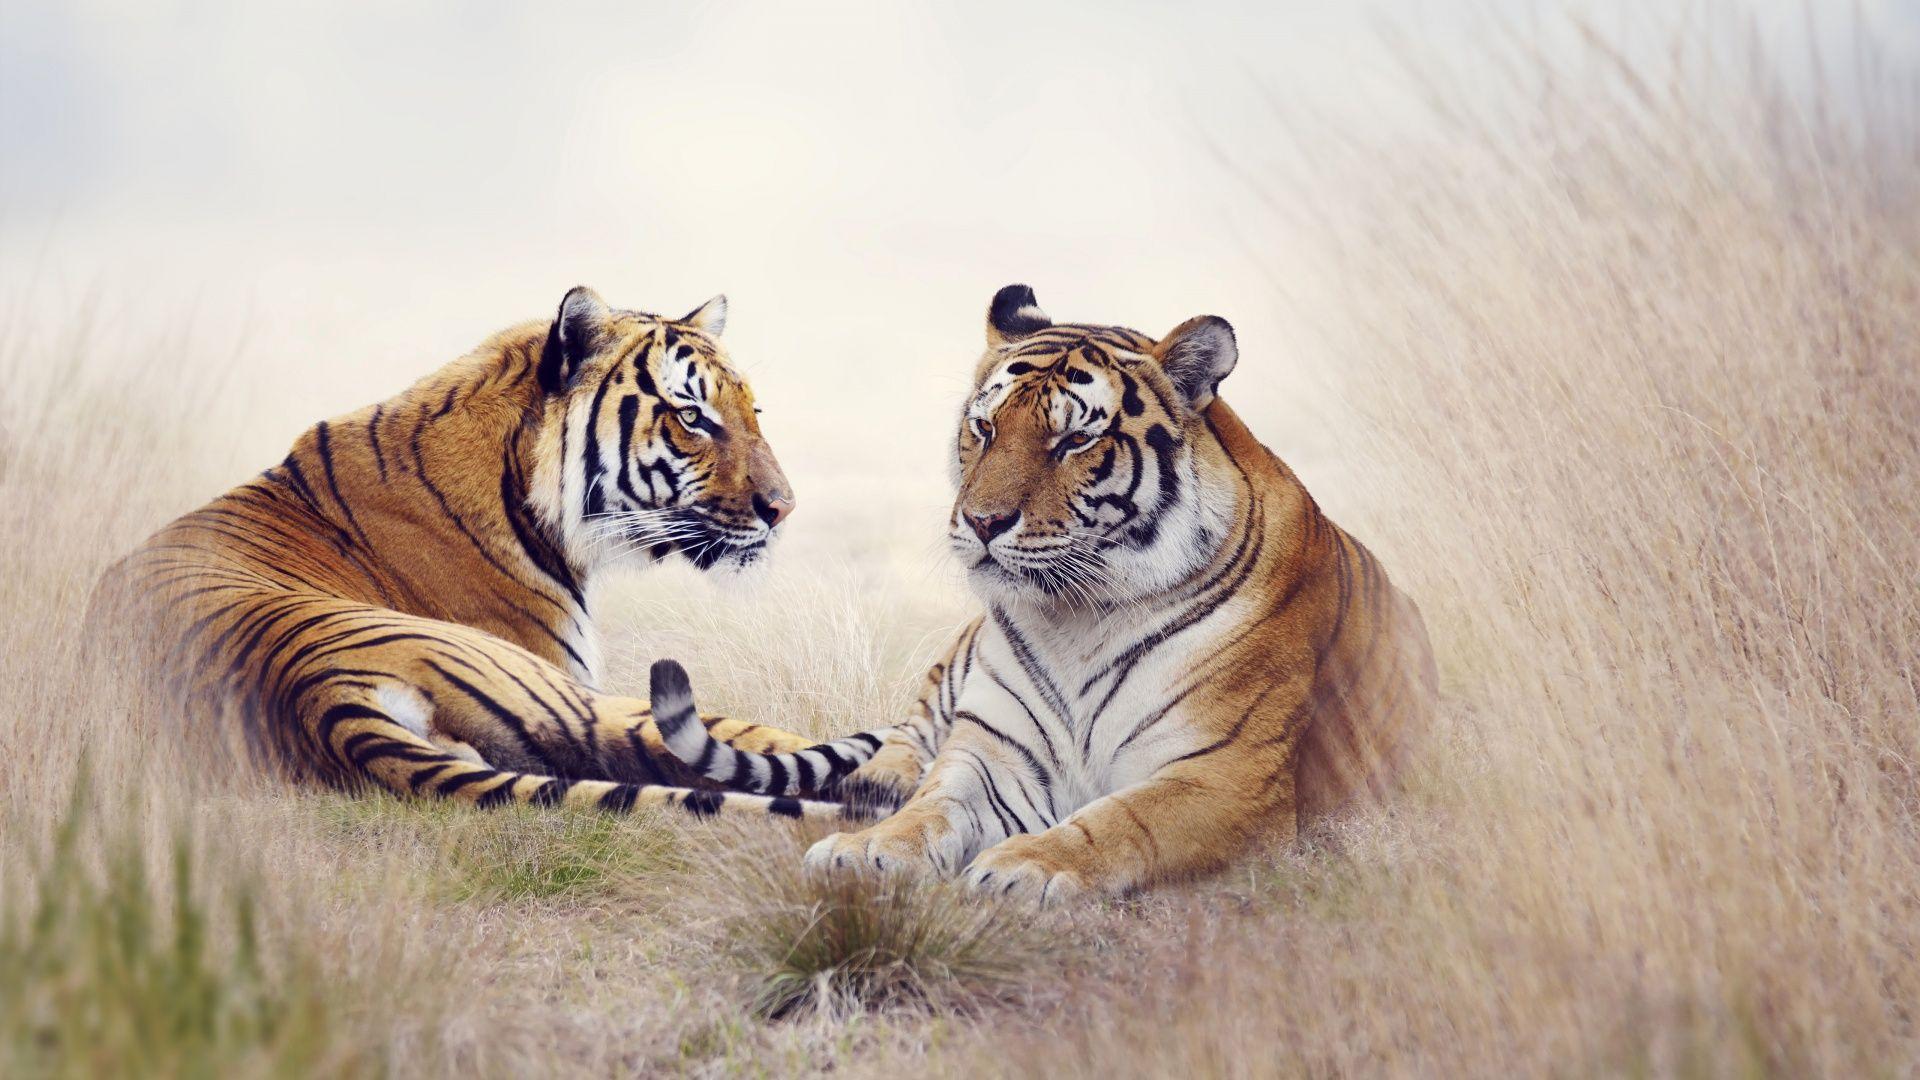 Beautiful Tiger Pair [1920x1080] Need iPhone 6S Plus